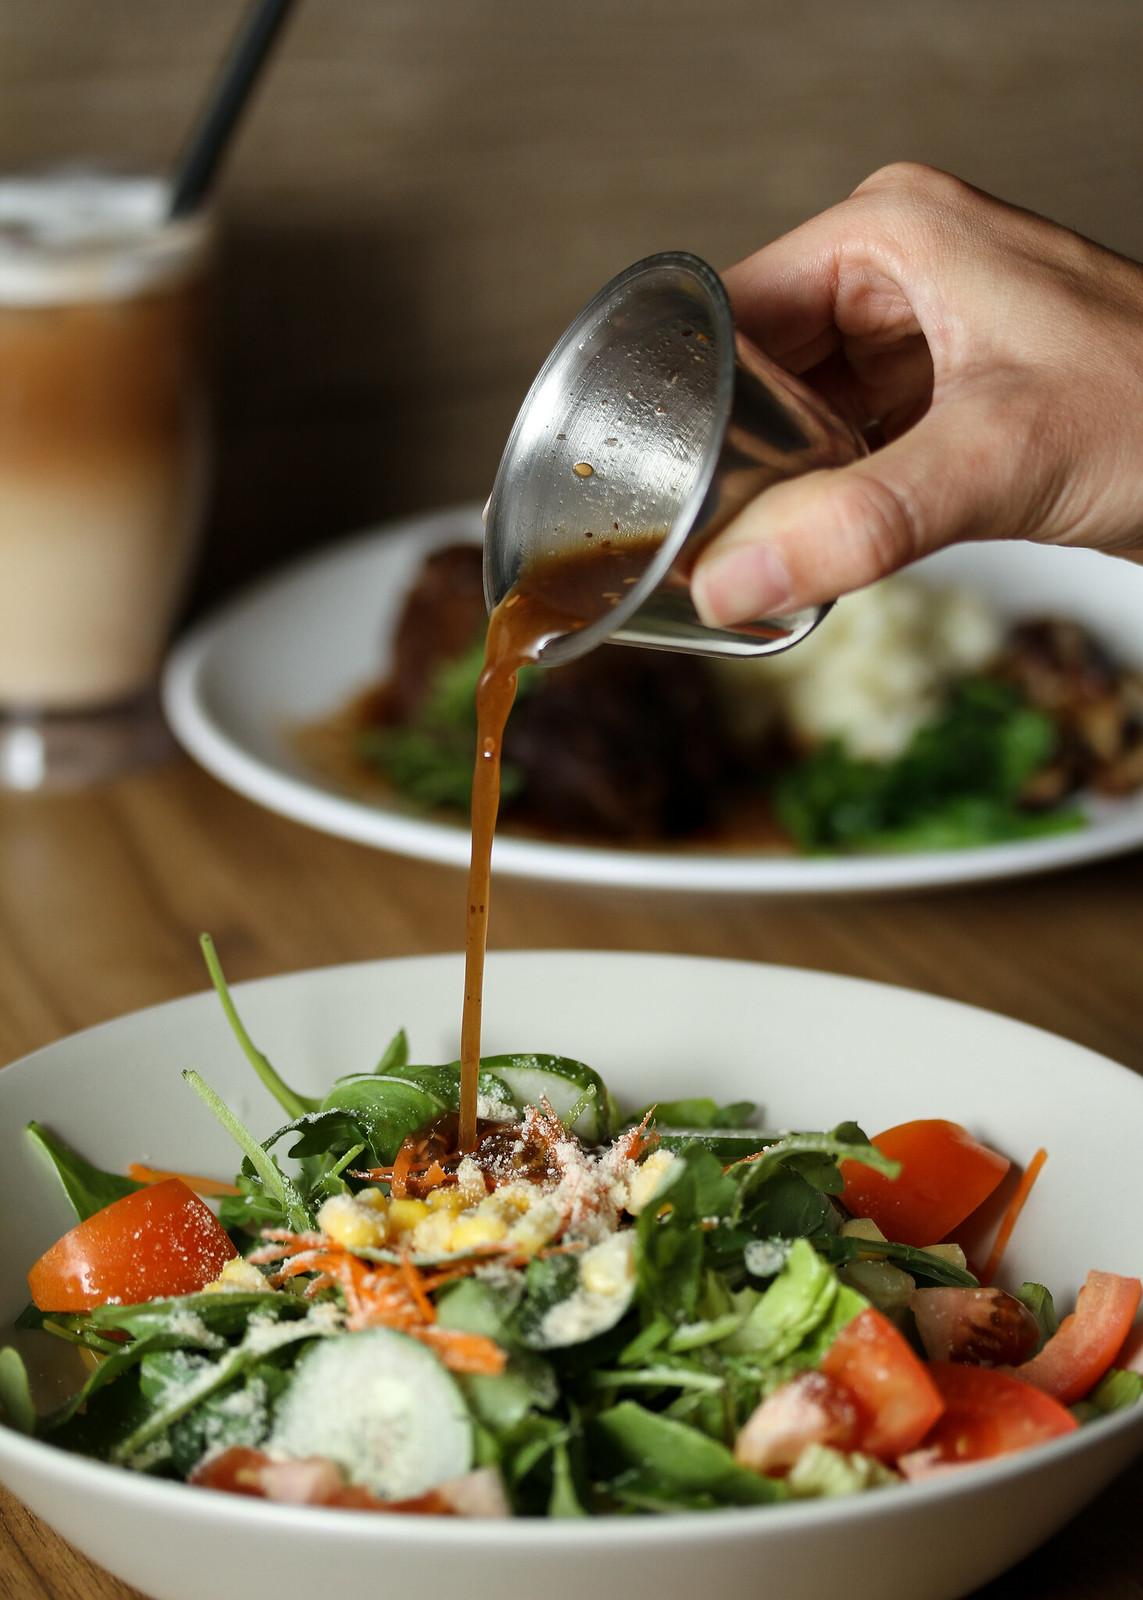 Daily Affairs Salad - Dressing